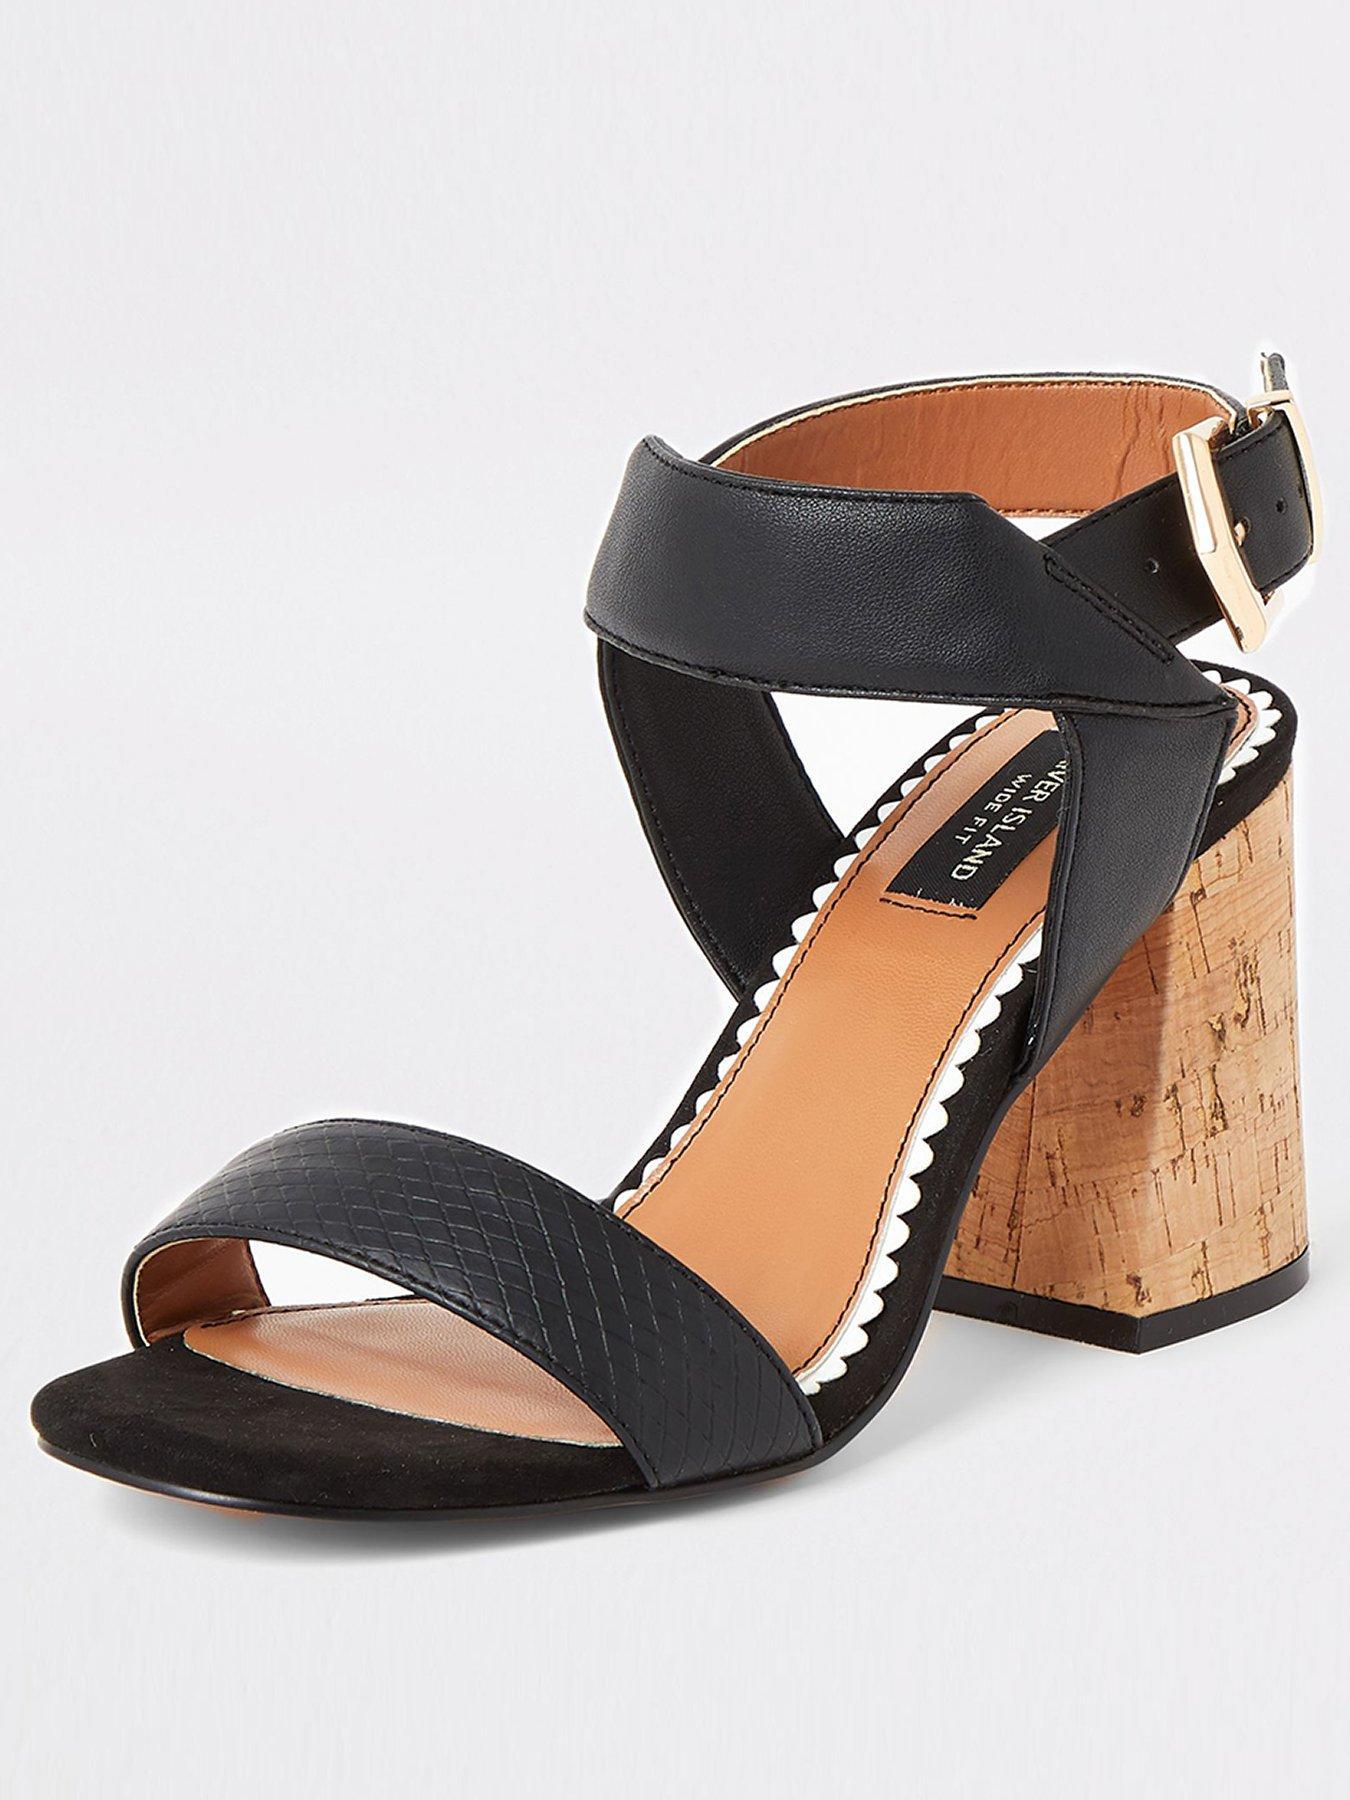 RRP £149. Hobbs Ophelia Fine Suede Black Mule Shoes Various Sizes